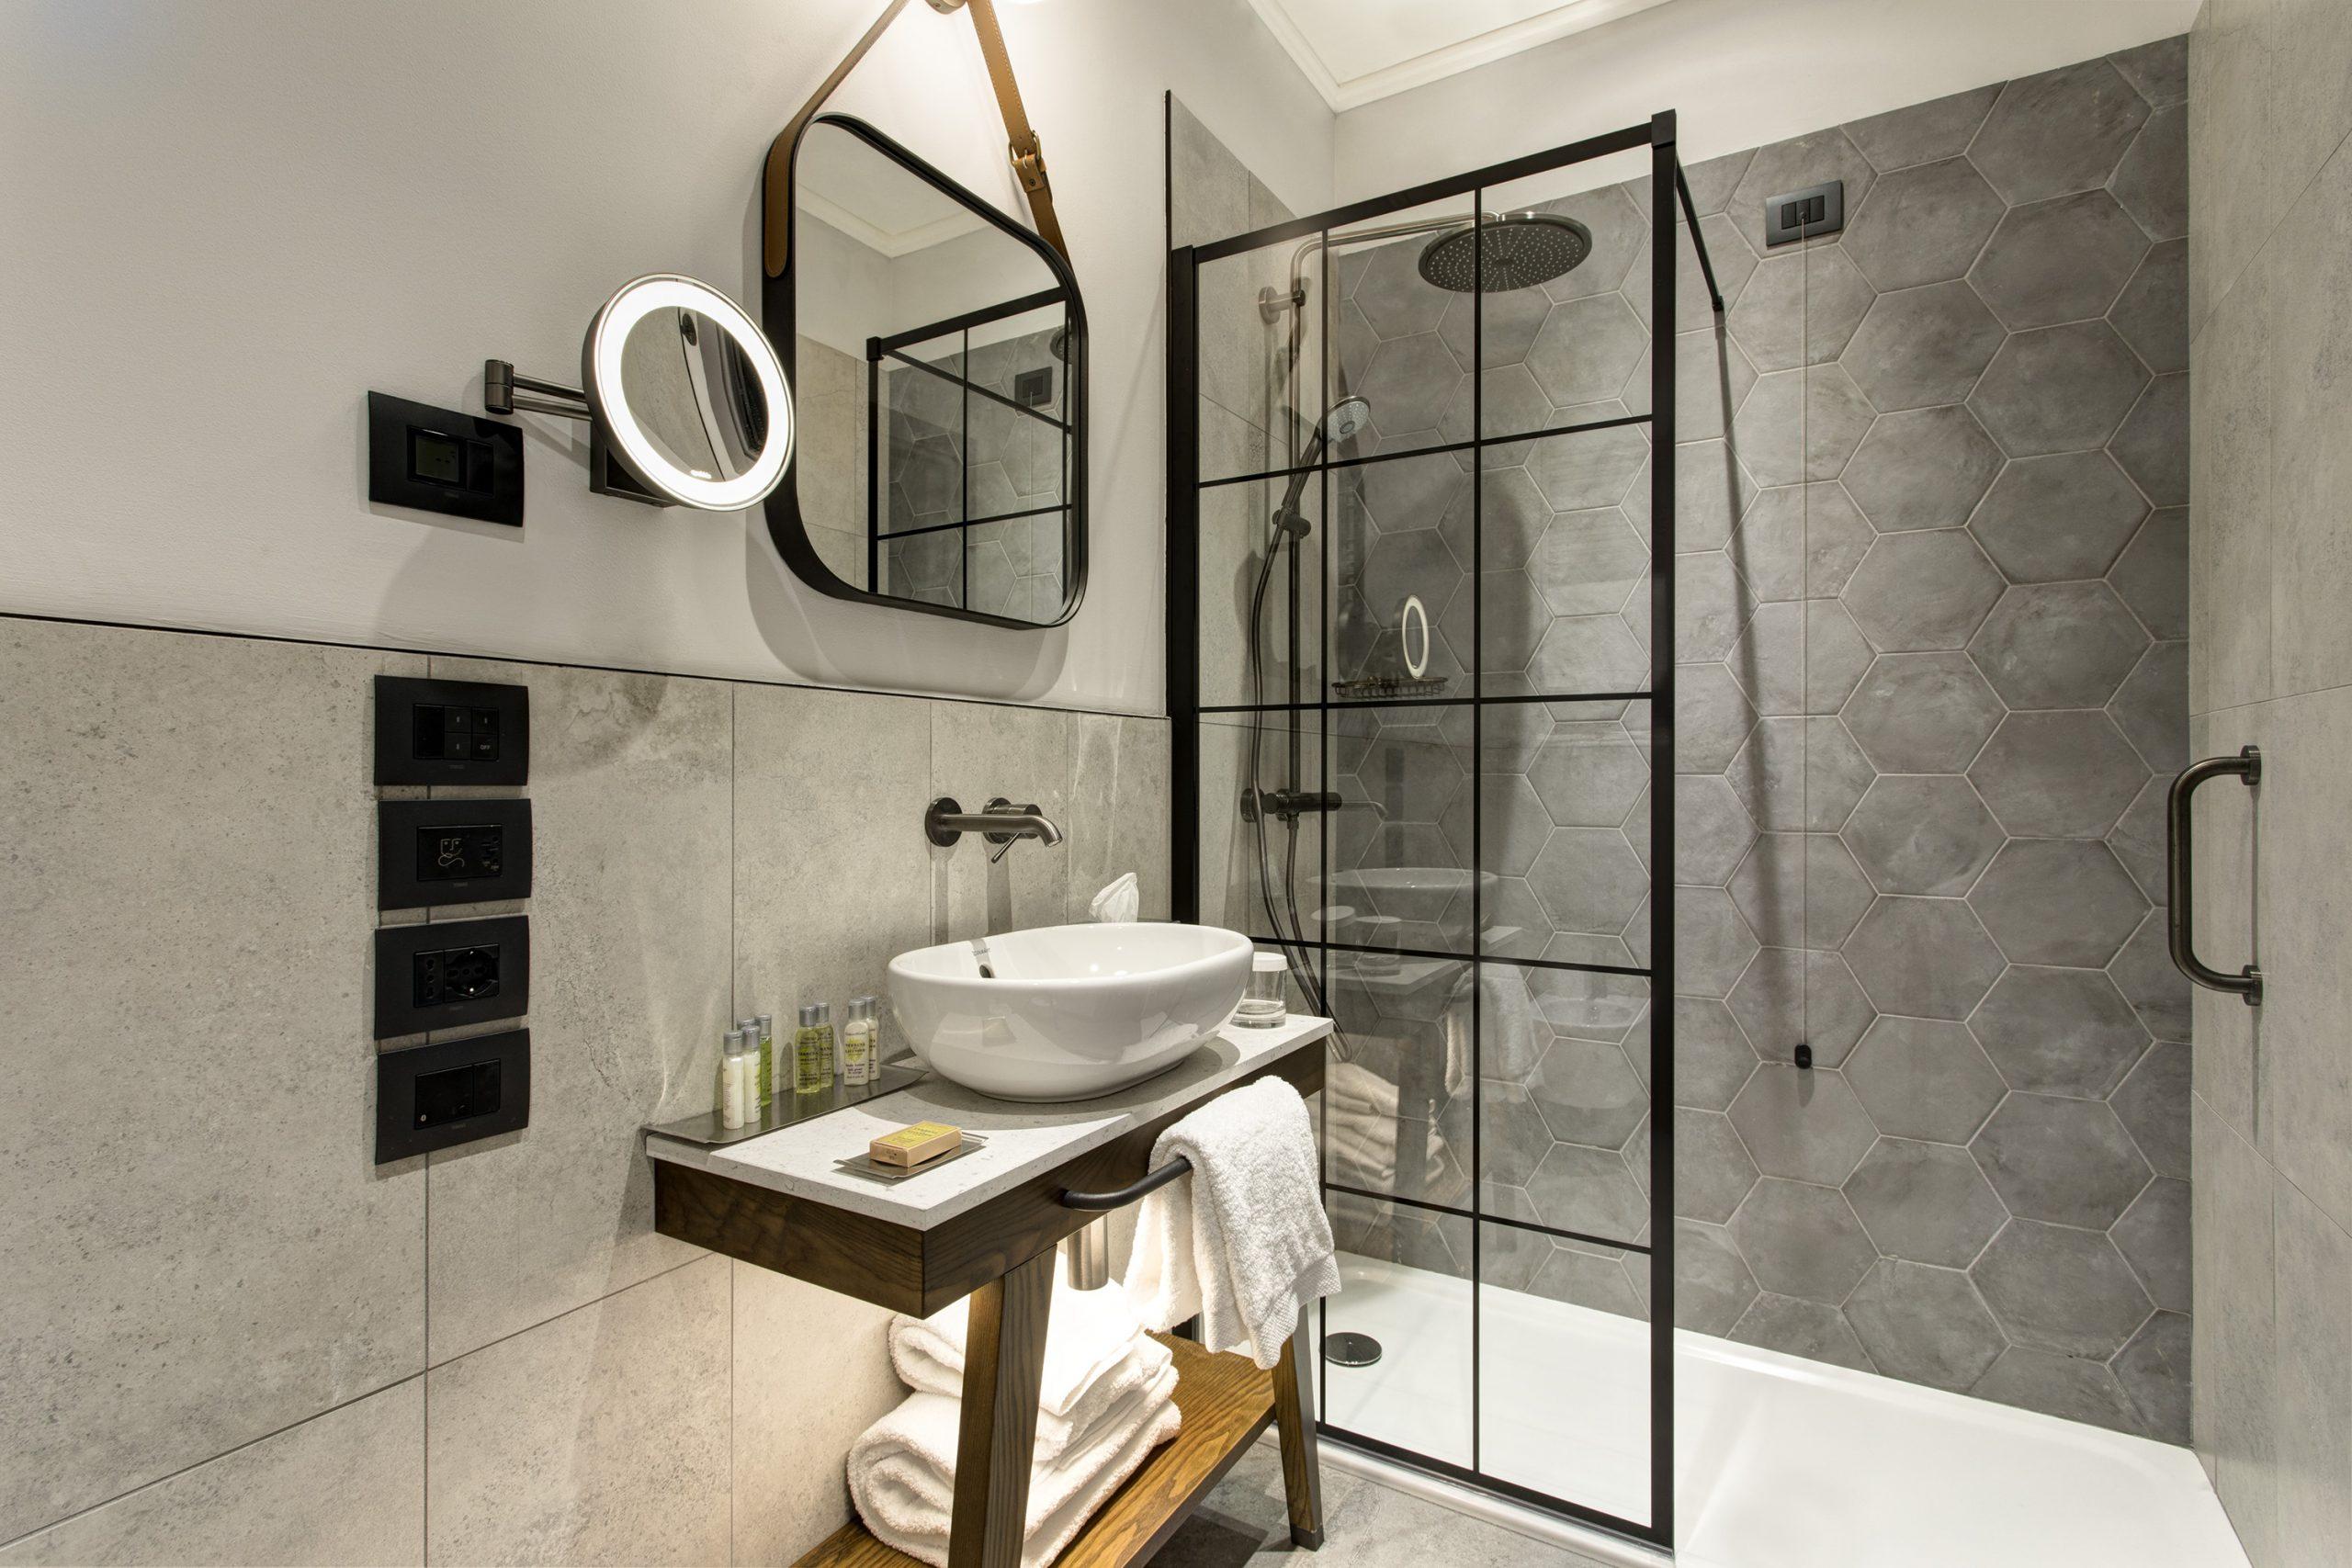 Rooms - Bathroom Superior Room